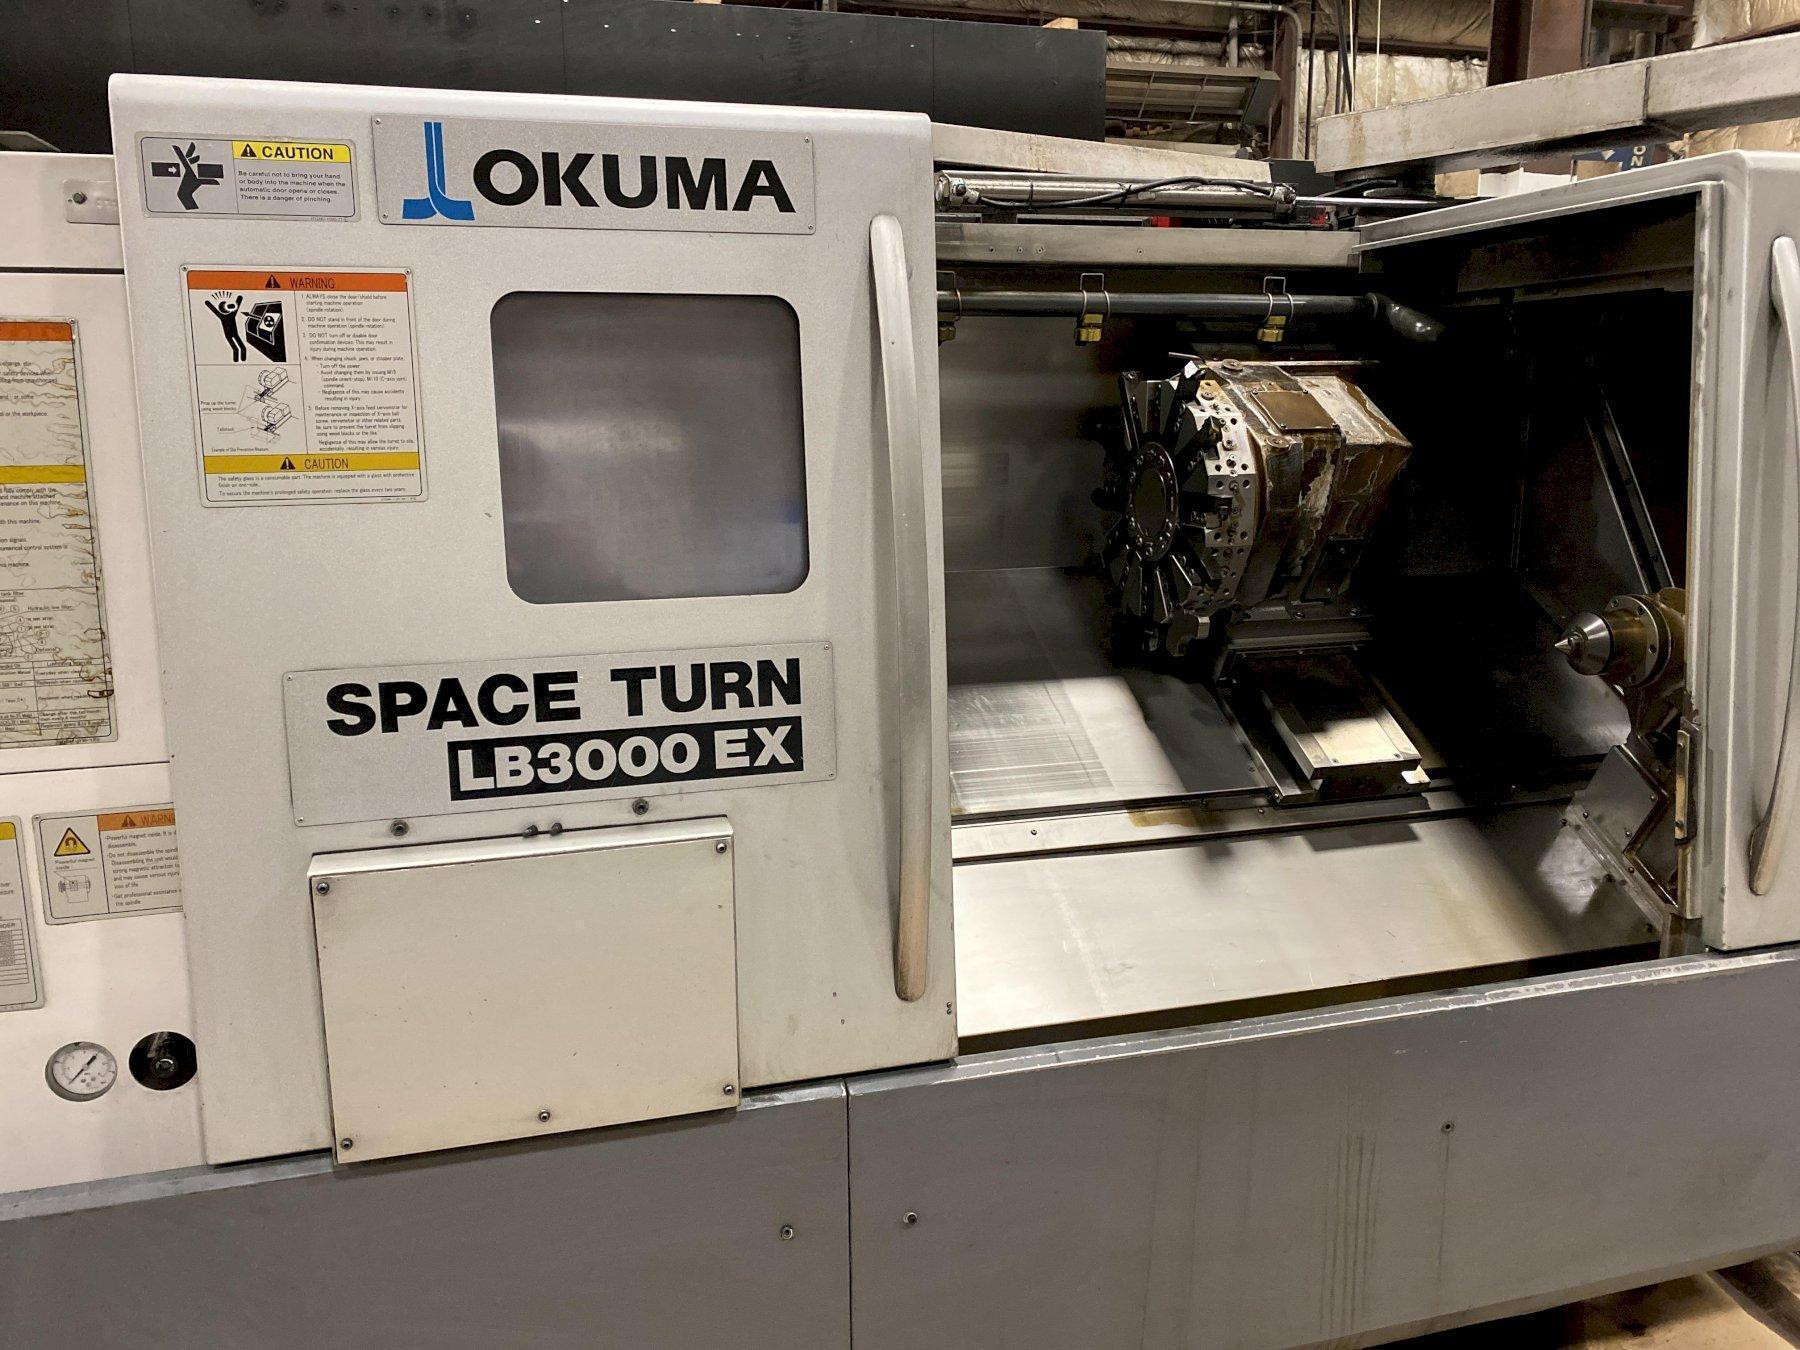 Okuma LB-3000EX C-1000 Spaceturn CNC Lathe, OSP P200LA, 12